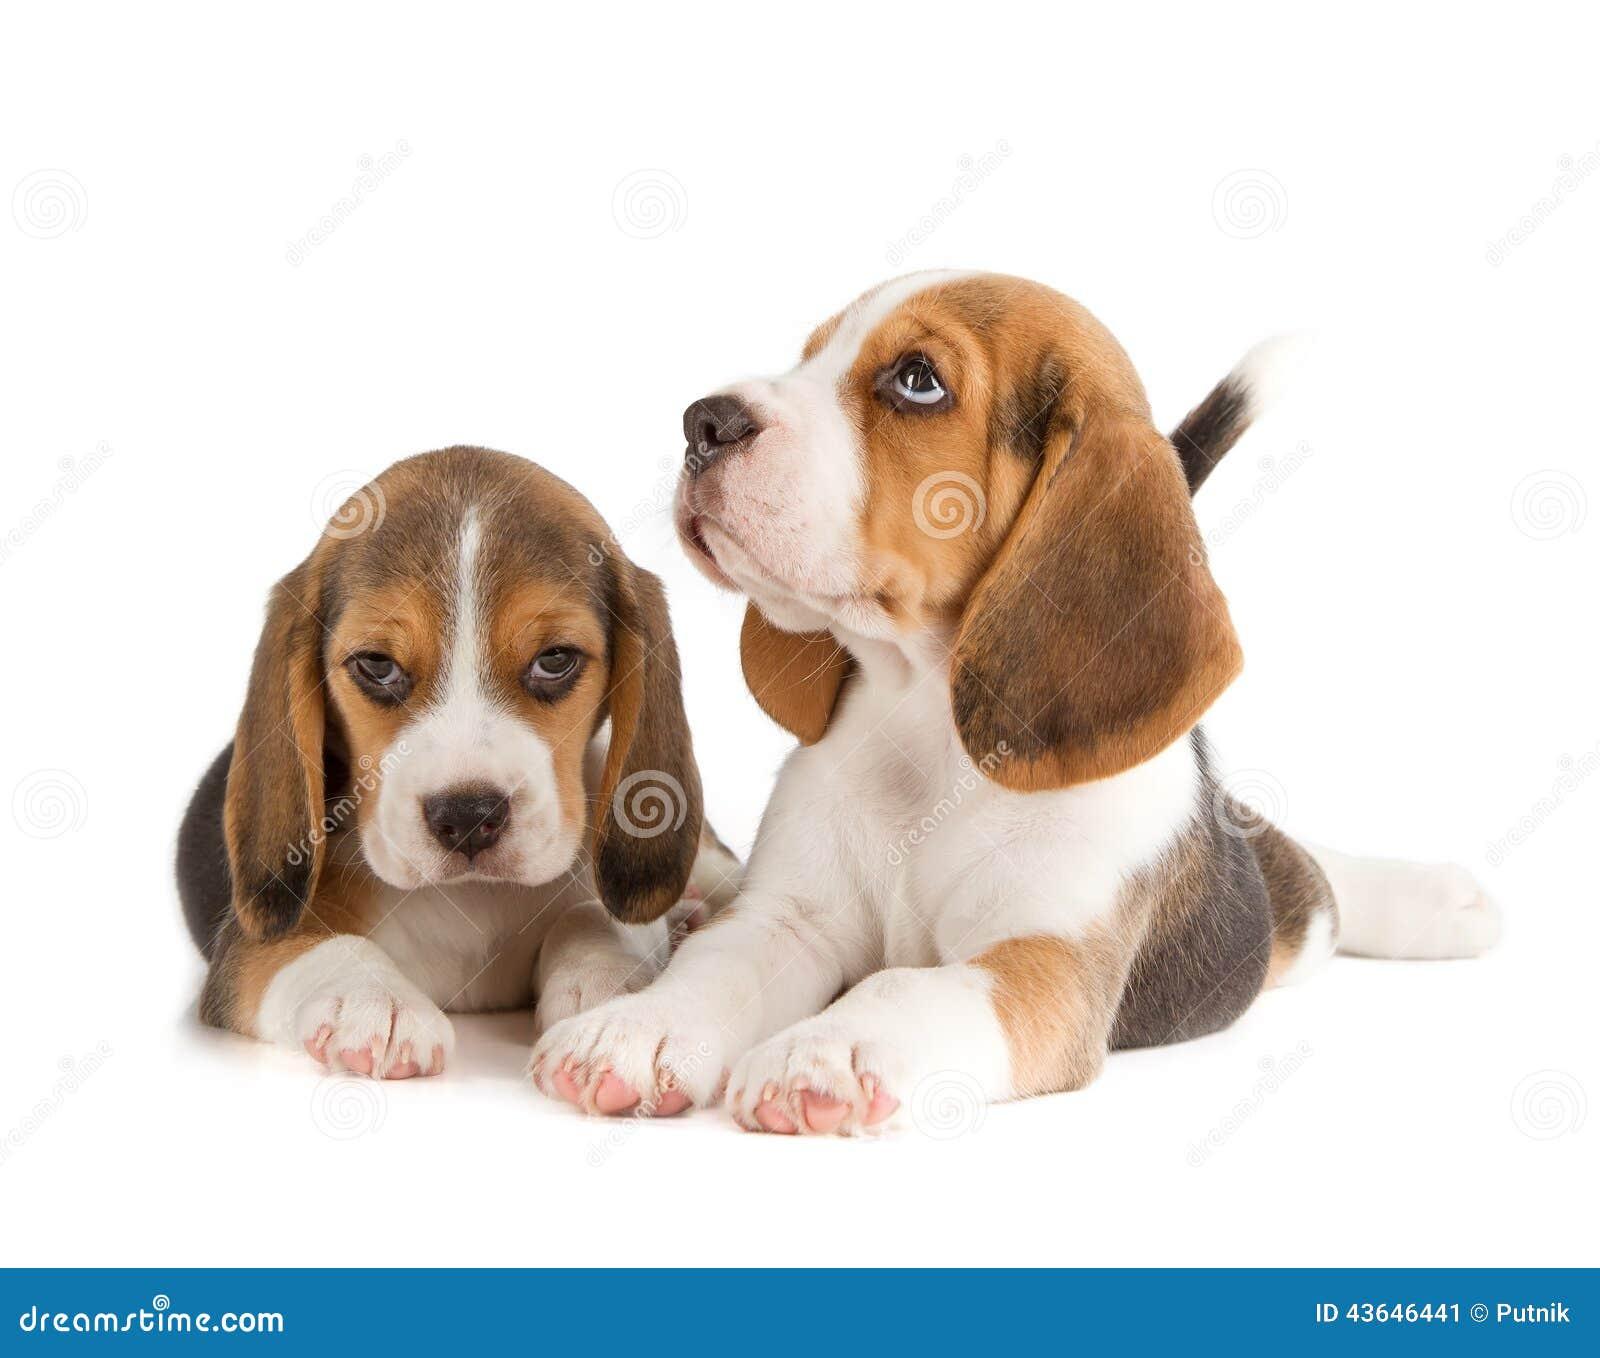 Cute Beagle Puppy Stock Photo - Image: 43646441